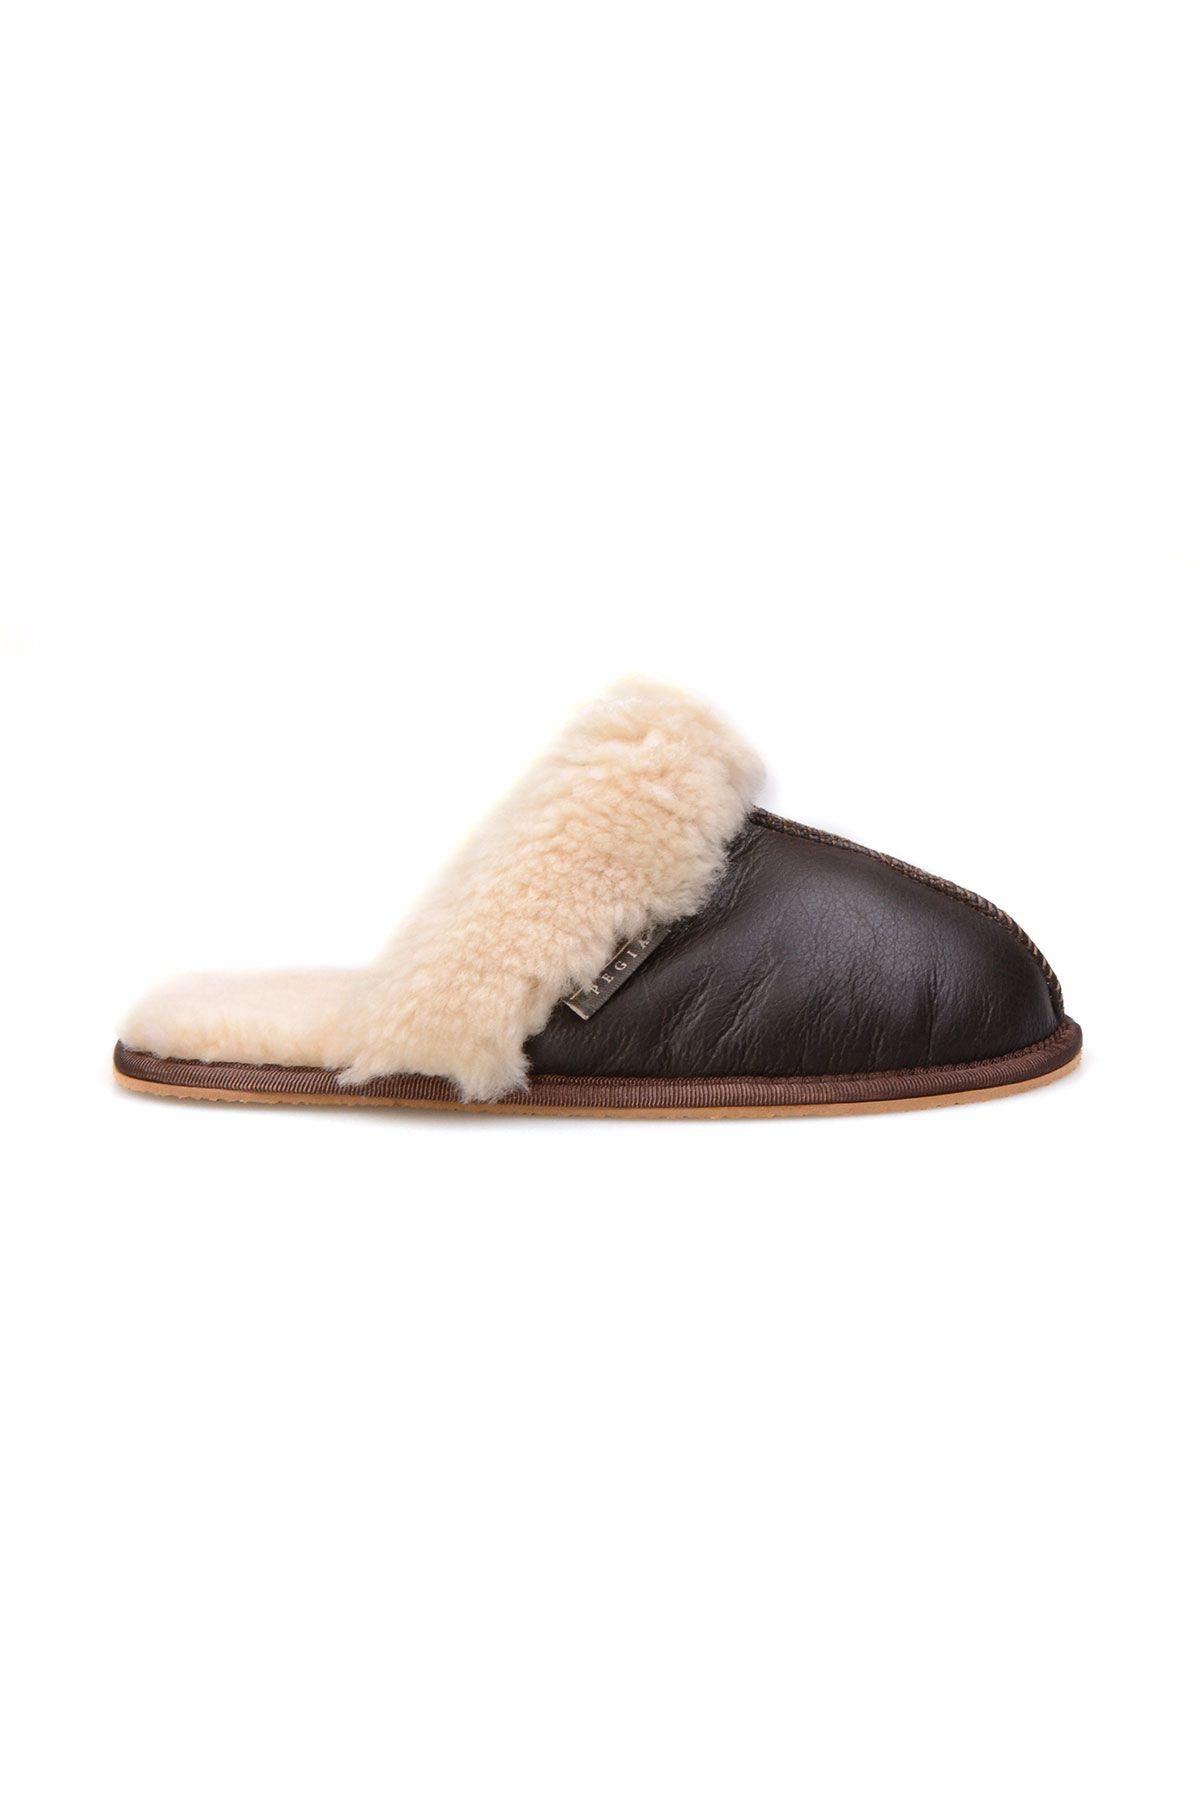 Pegia Genuine Sheepskin Women's House Slippers 191103 Brown